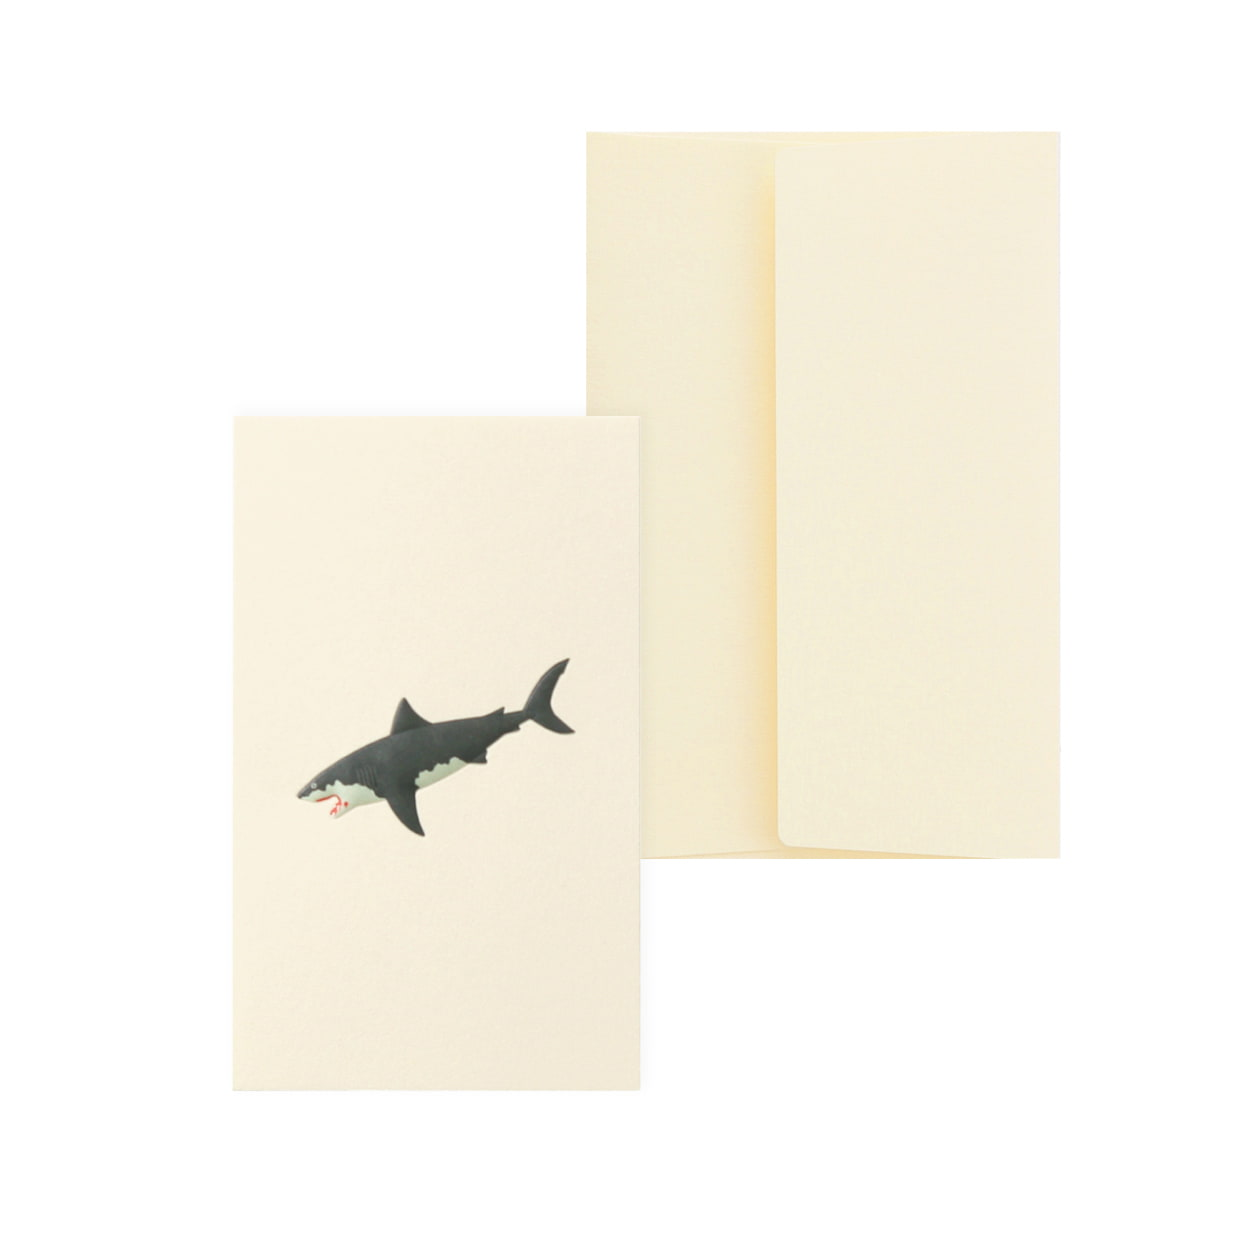 No.700 サメ ミニカードセット